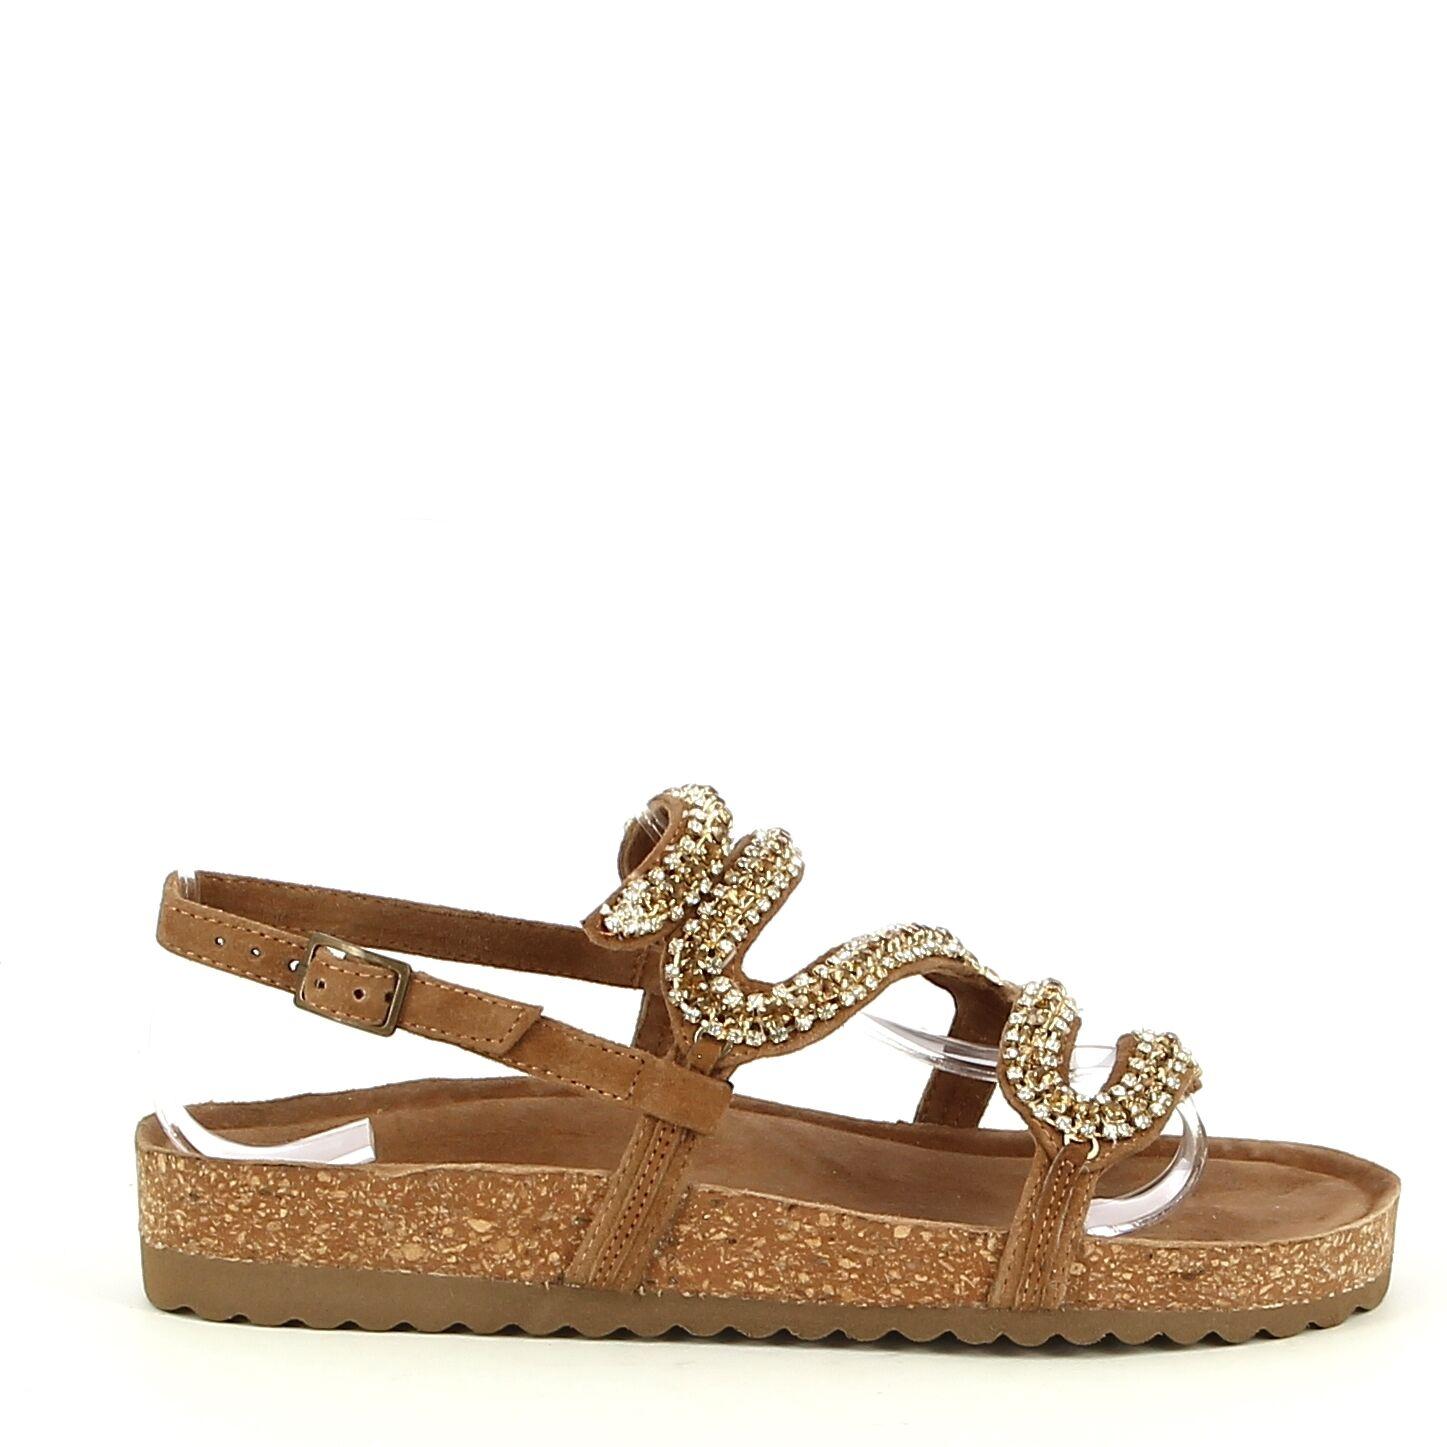 Ken Shoe Fashion - Camel/Goud - Sandalen